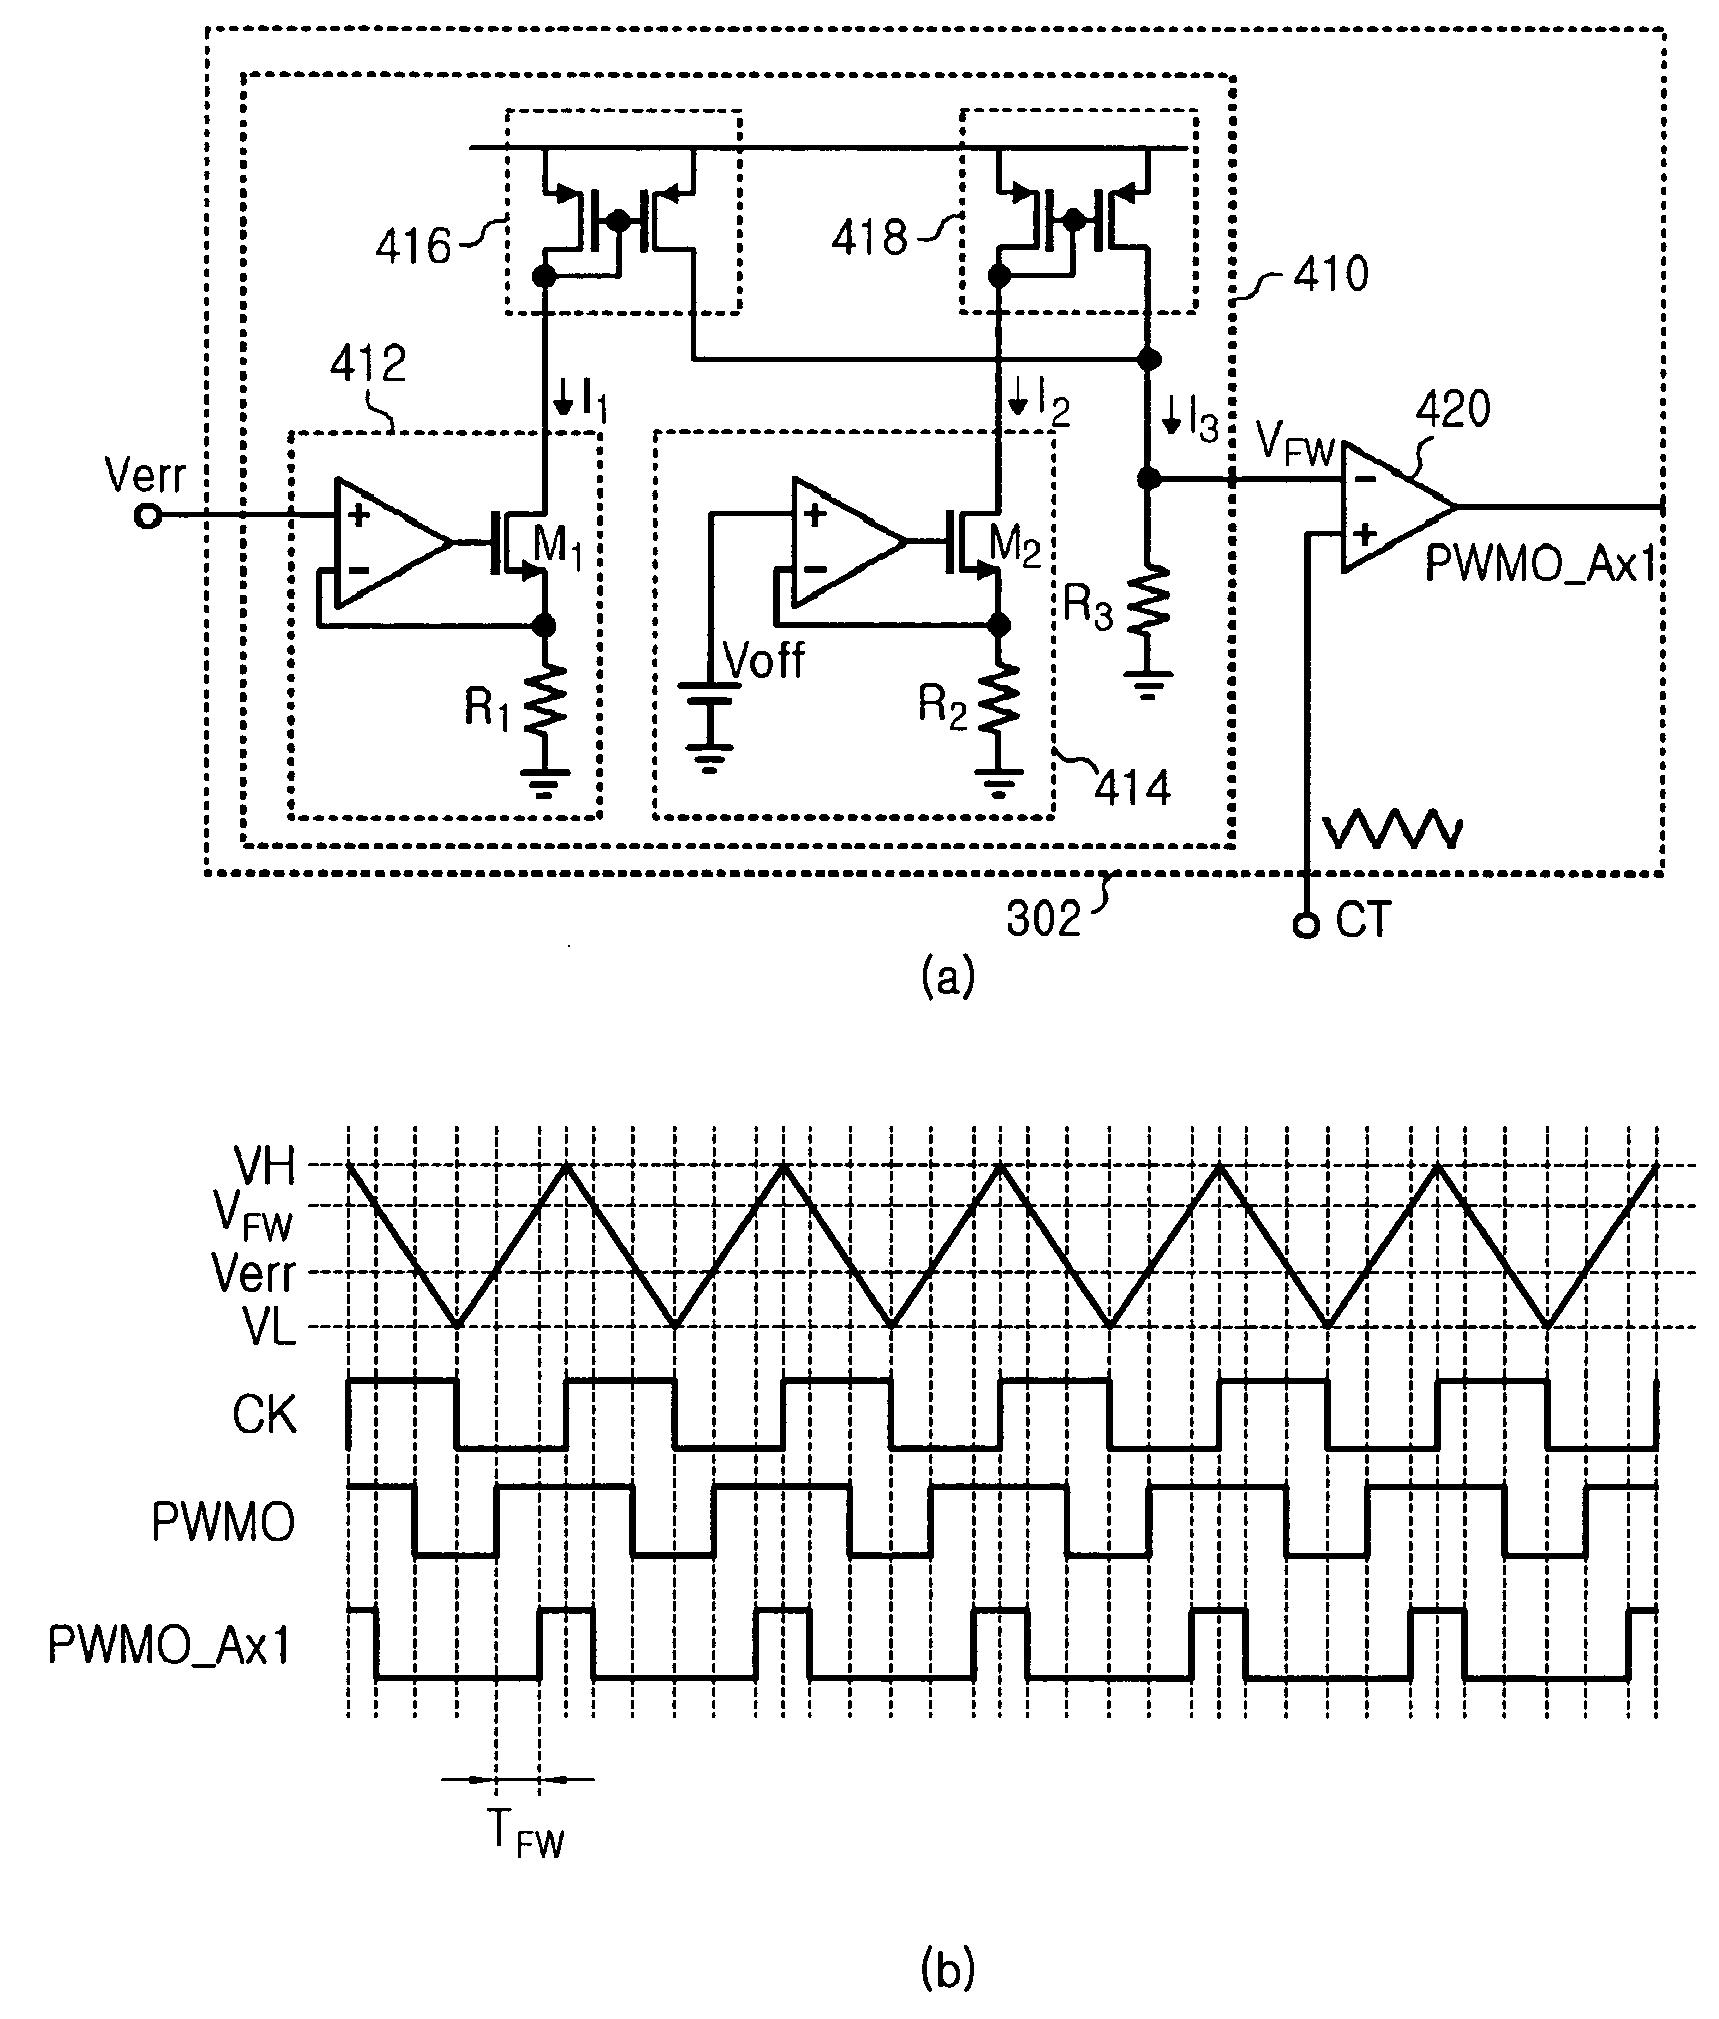 patent wo2010047455a1